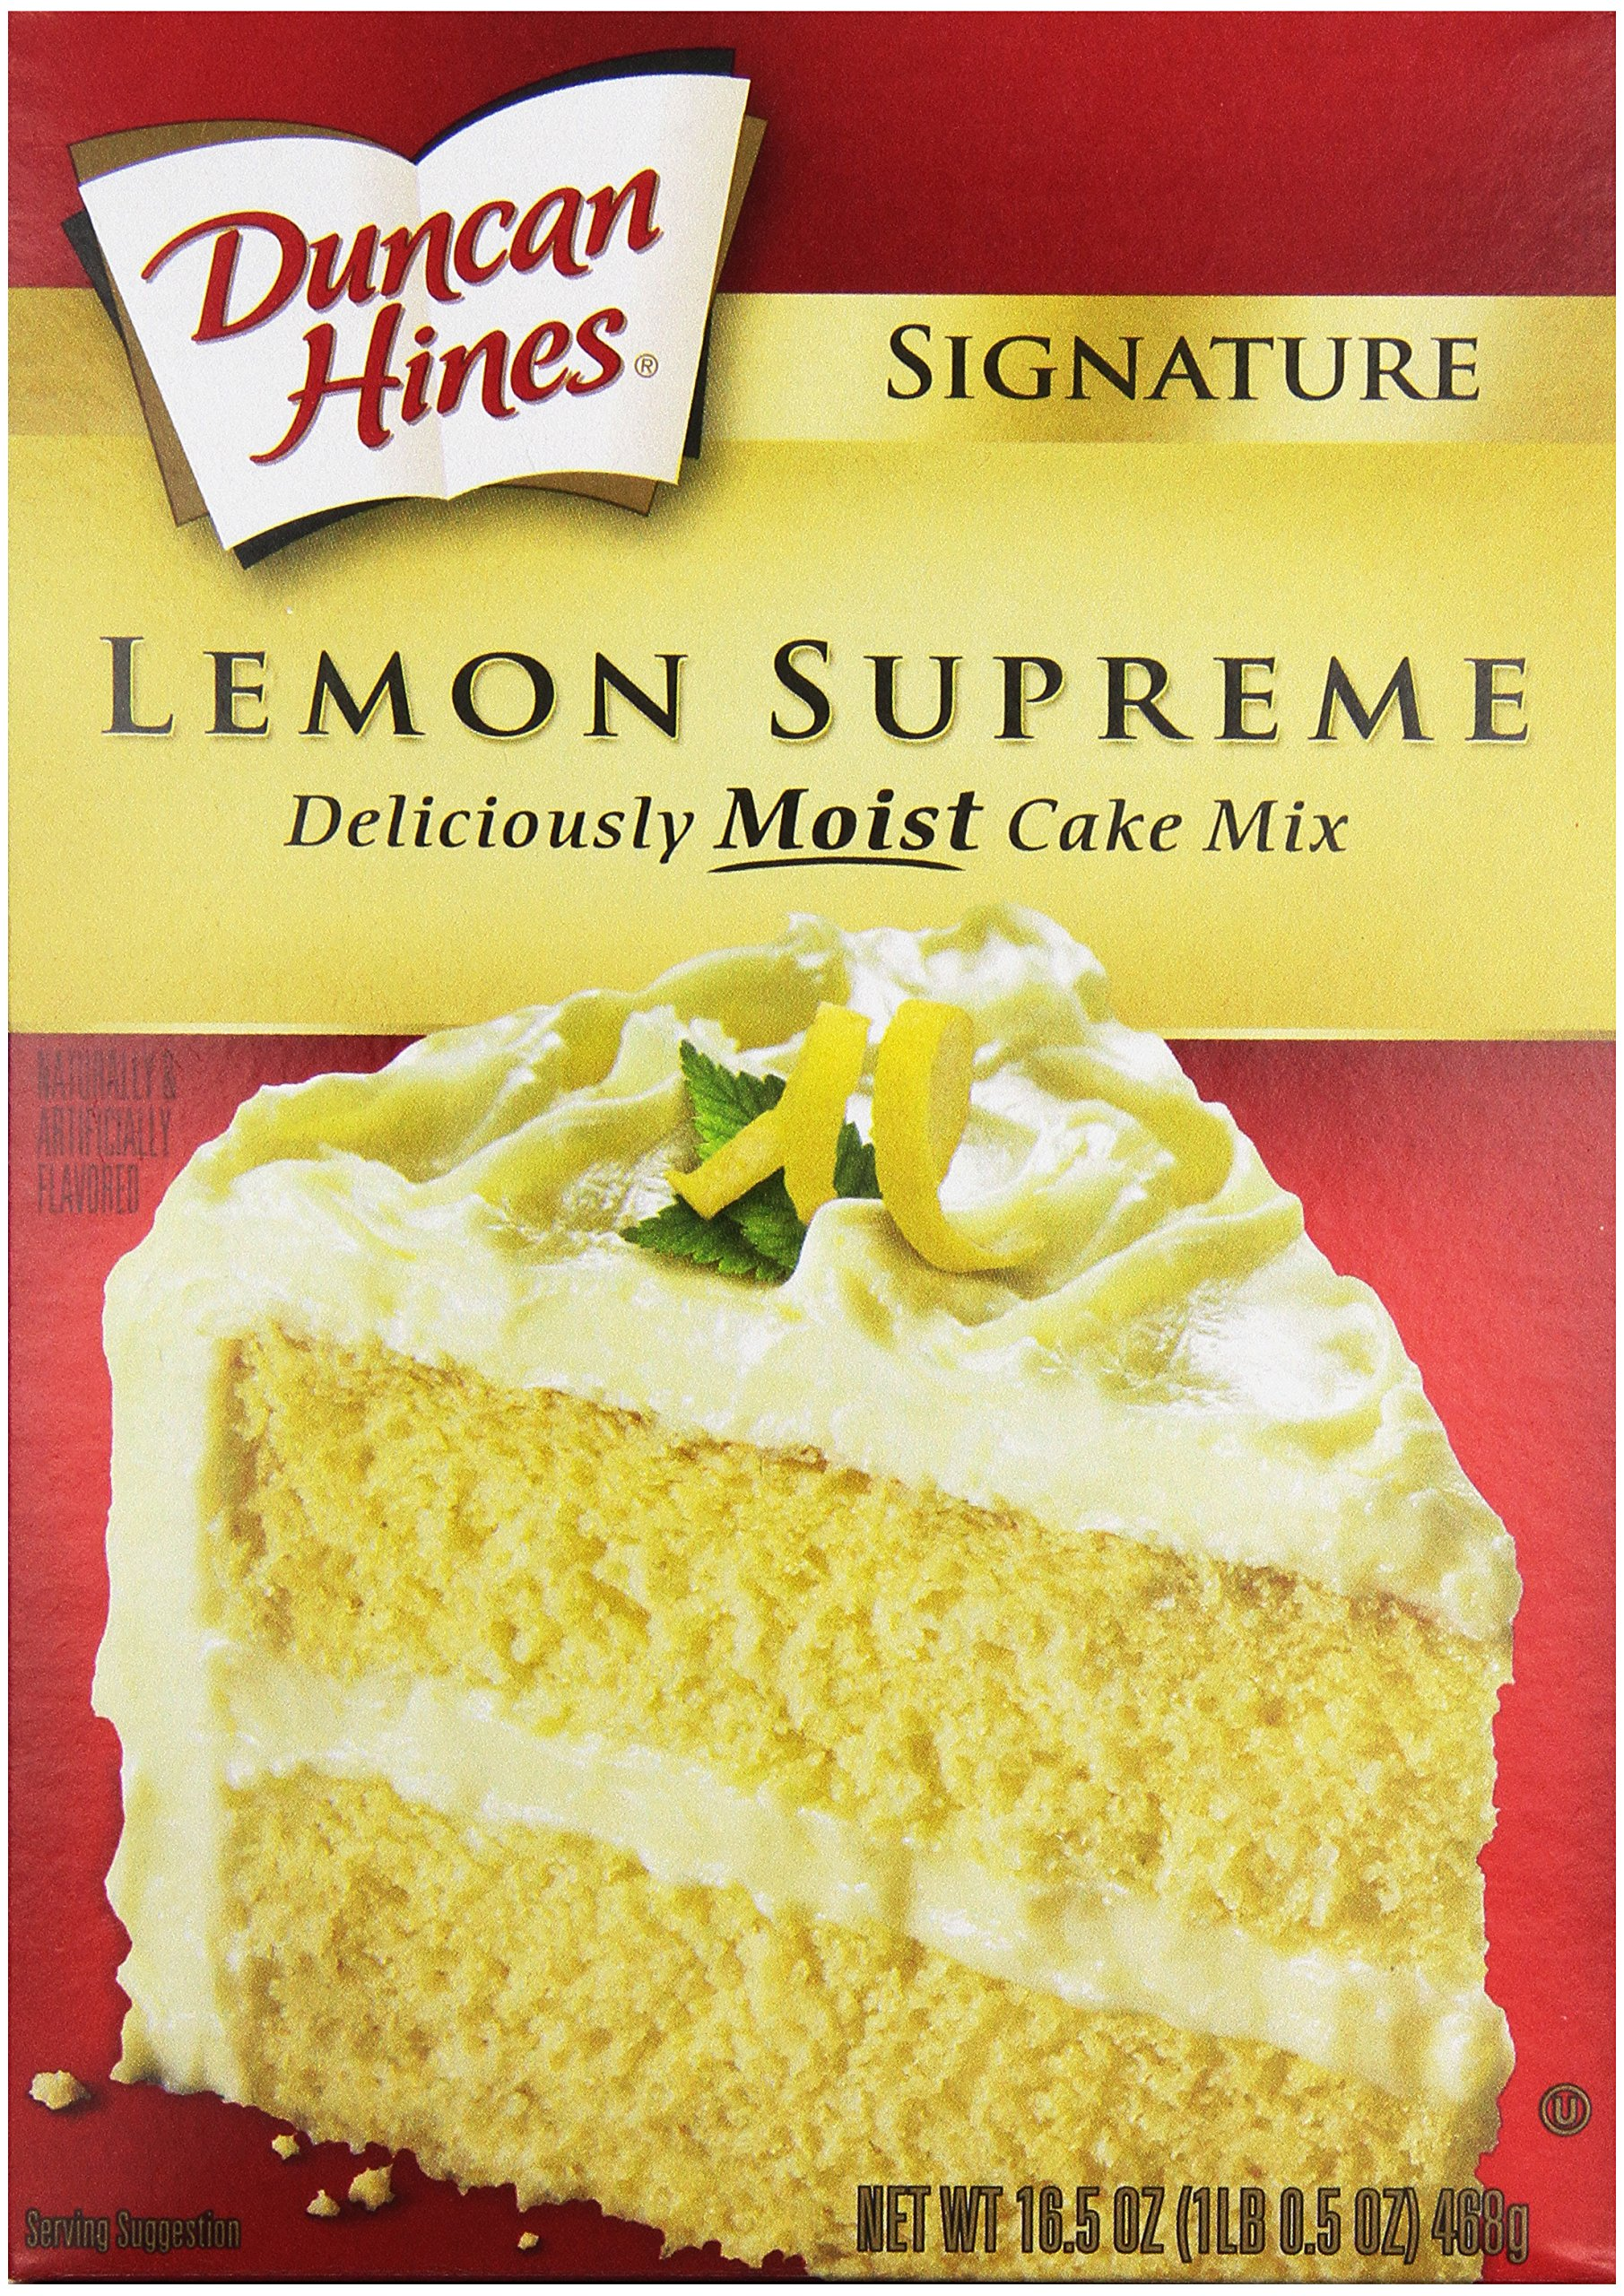 Duncan Hines Signature Cake Mix, Lemon Supreme, 16.5 oz